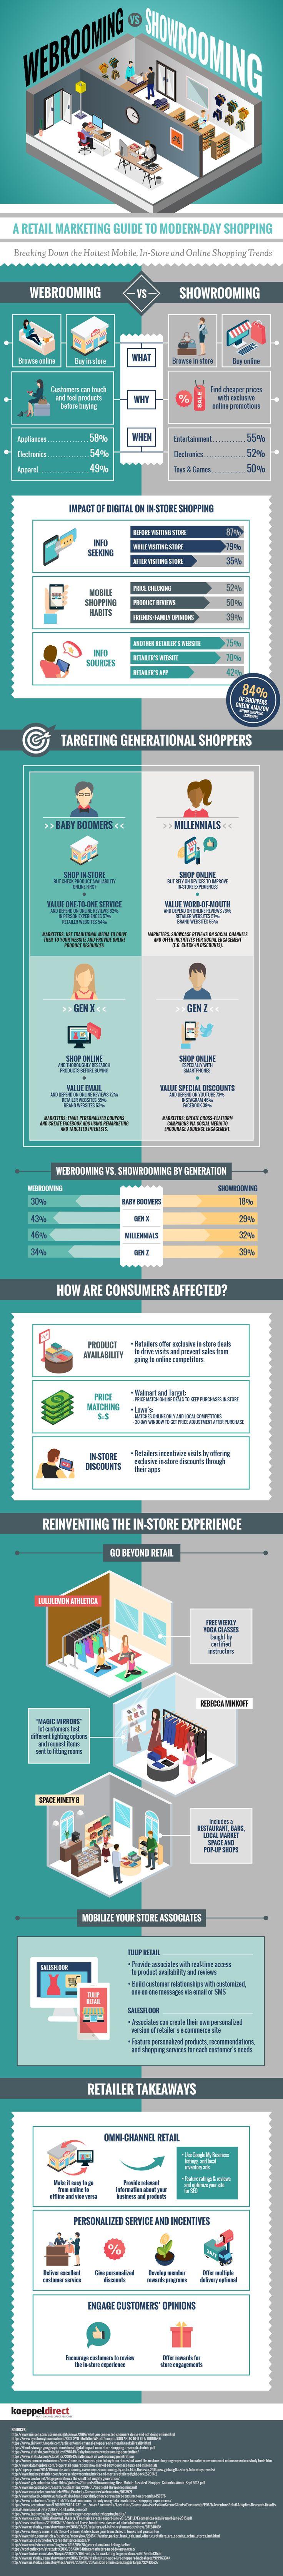 Webrooming vs. Showrooming